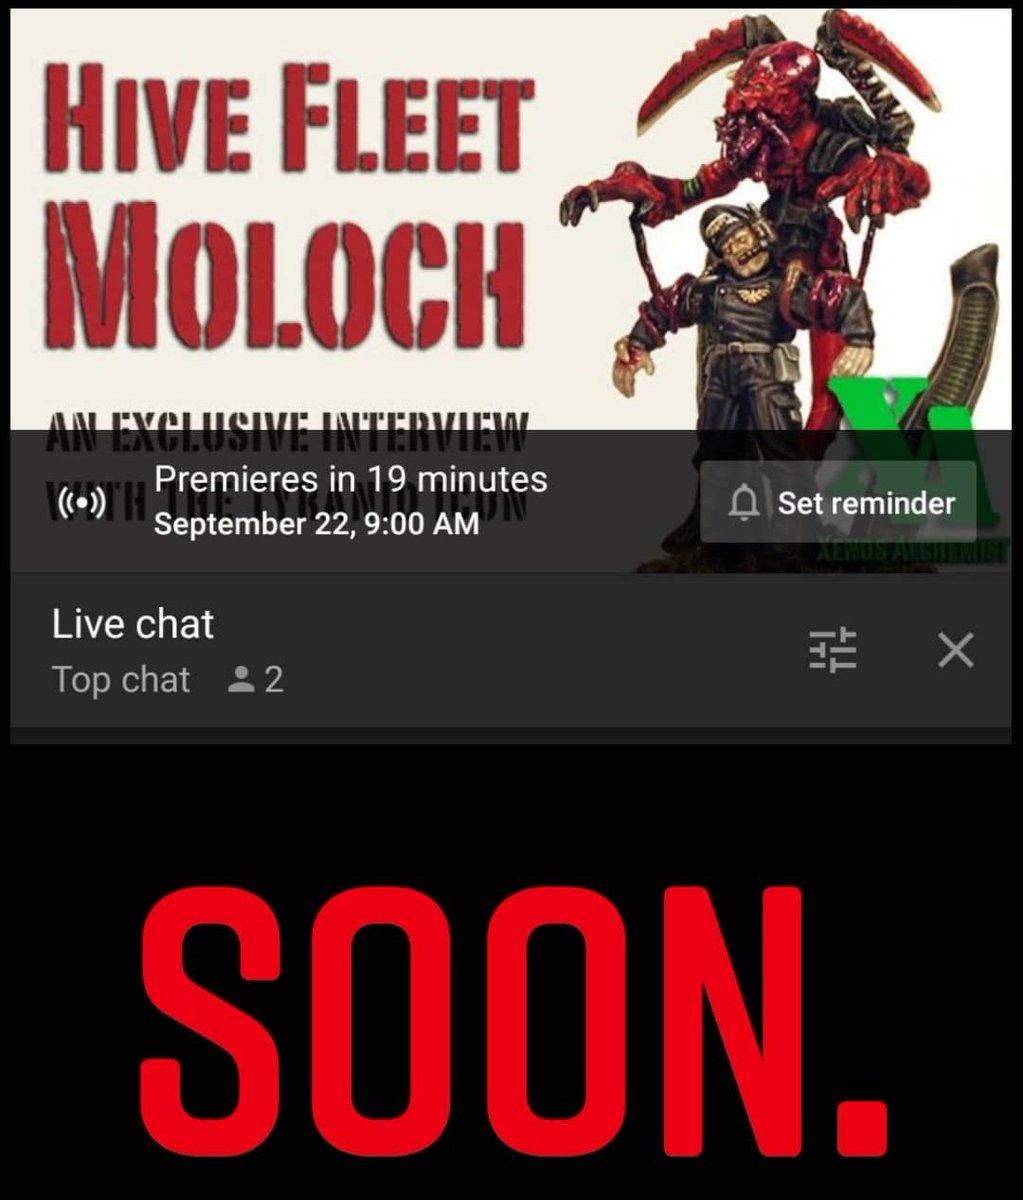 The Hive Fleet Moloch interview goes live in 20 mins.  https://t.co/ytO9Nxkumx #Tyranids #paintingwarhammer #warmongers https://t.co/2oPUhzN3iZ